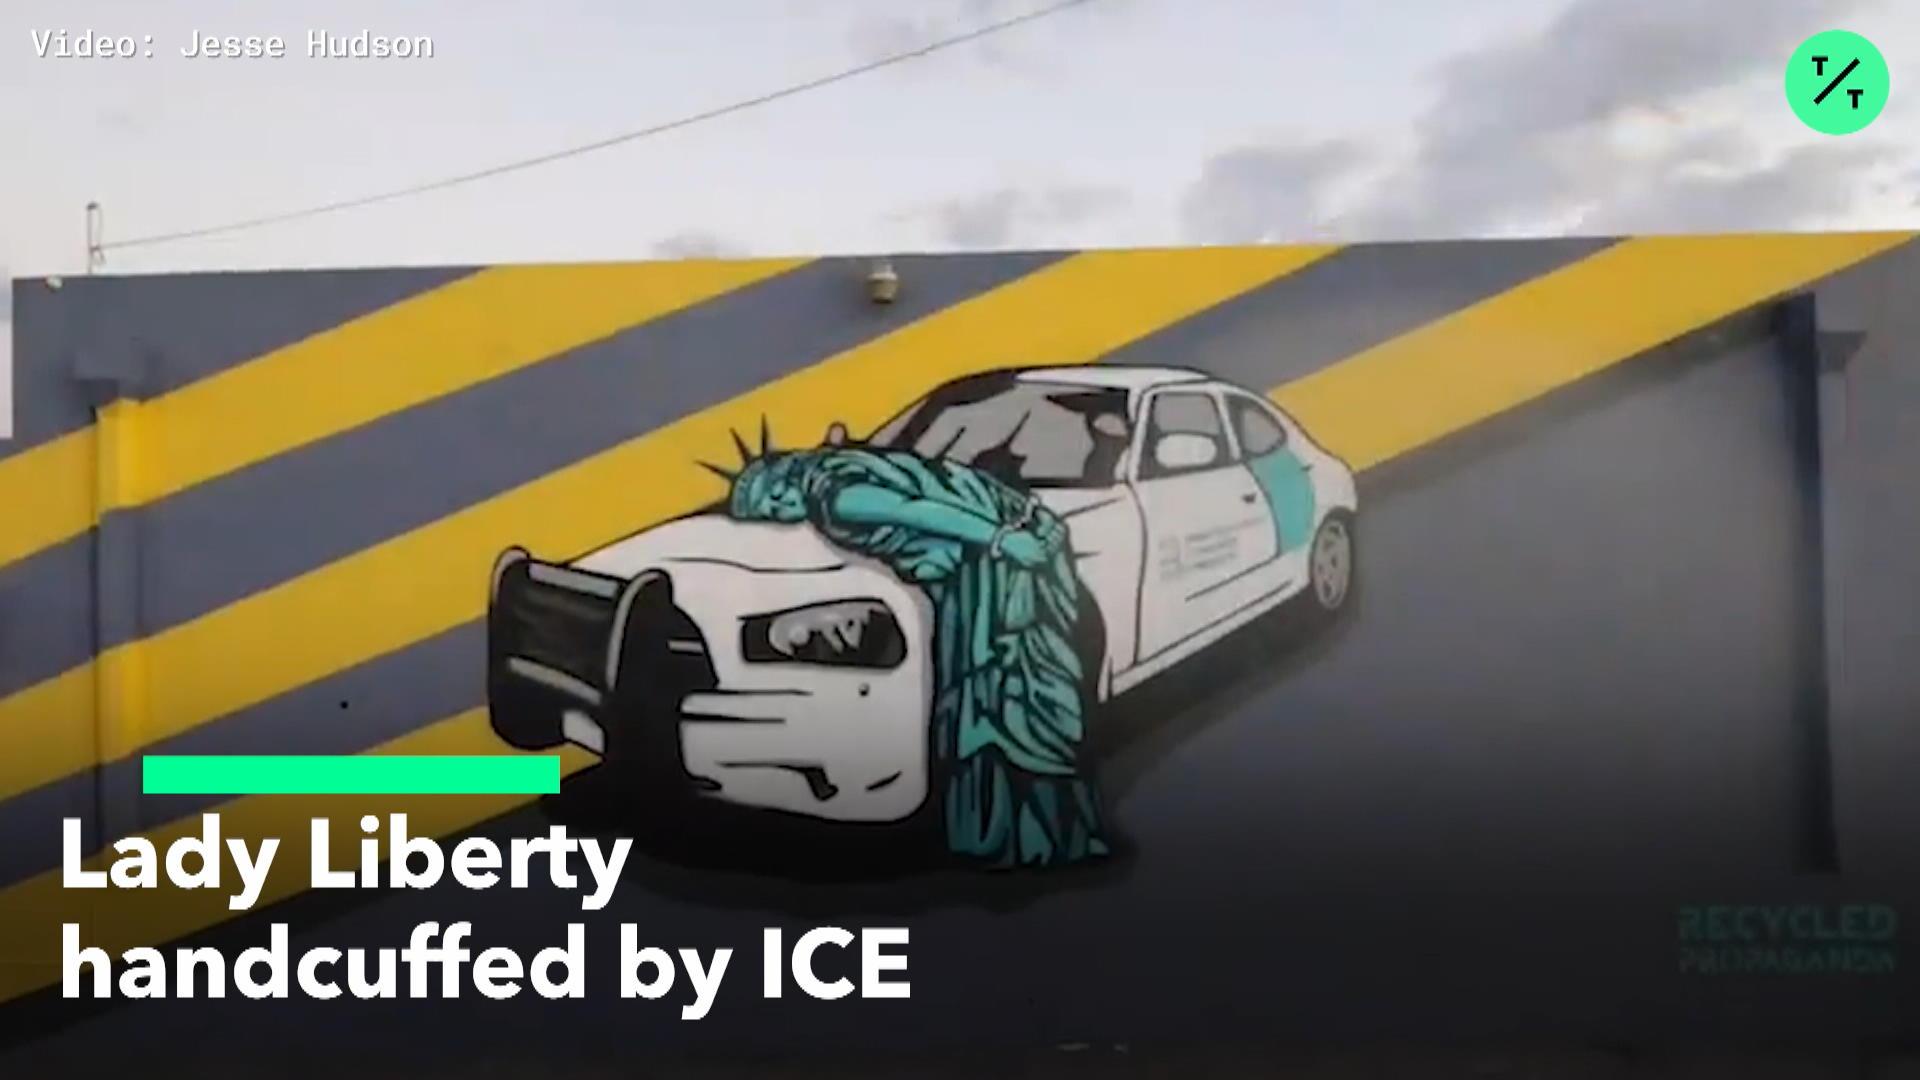 Lady Liberty Handcuffed By ICE